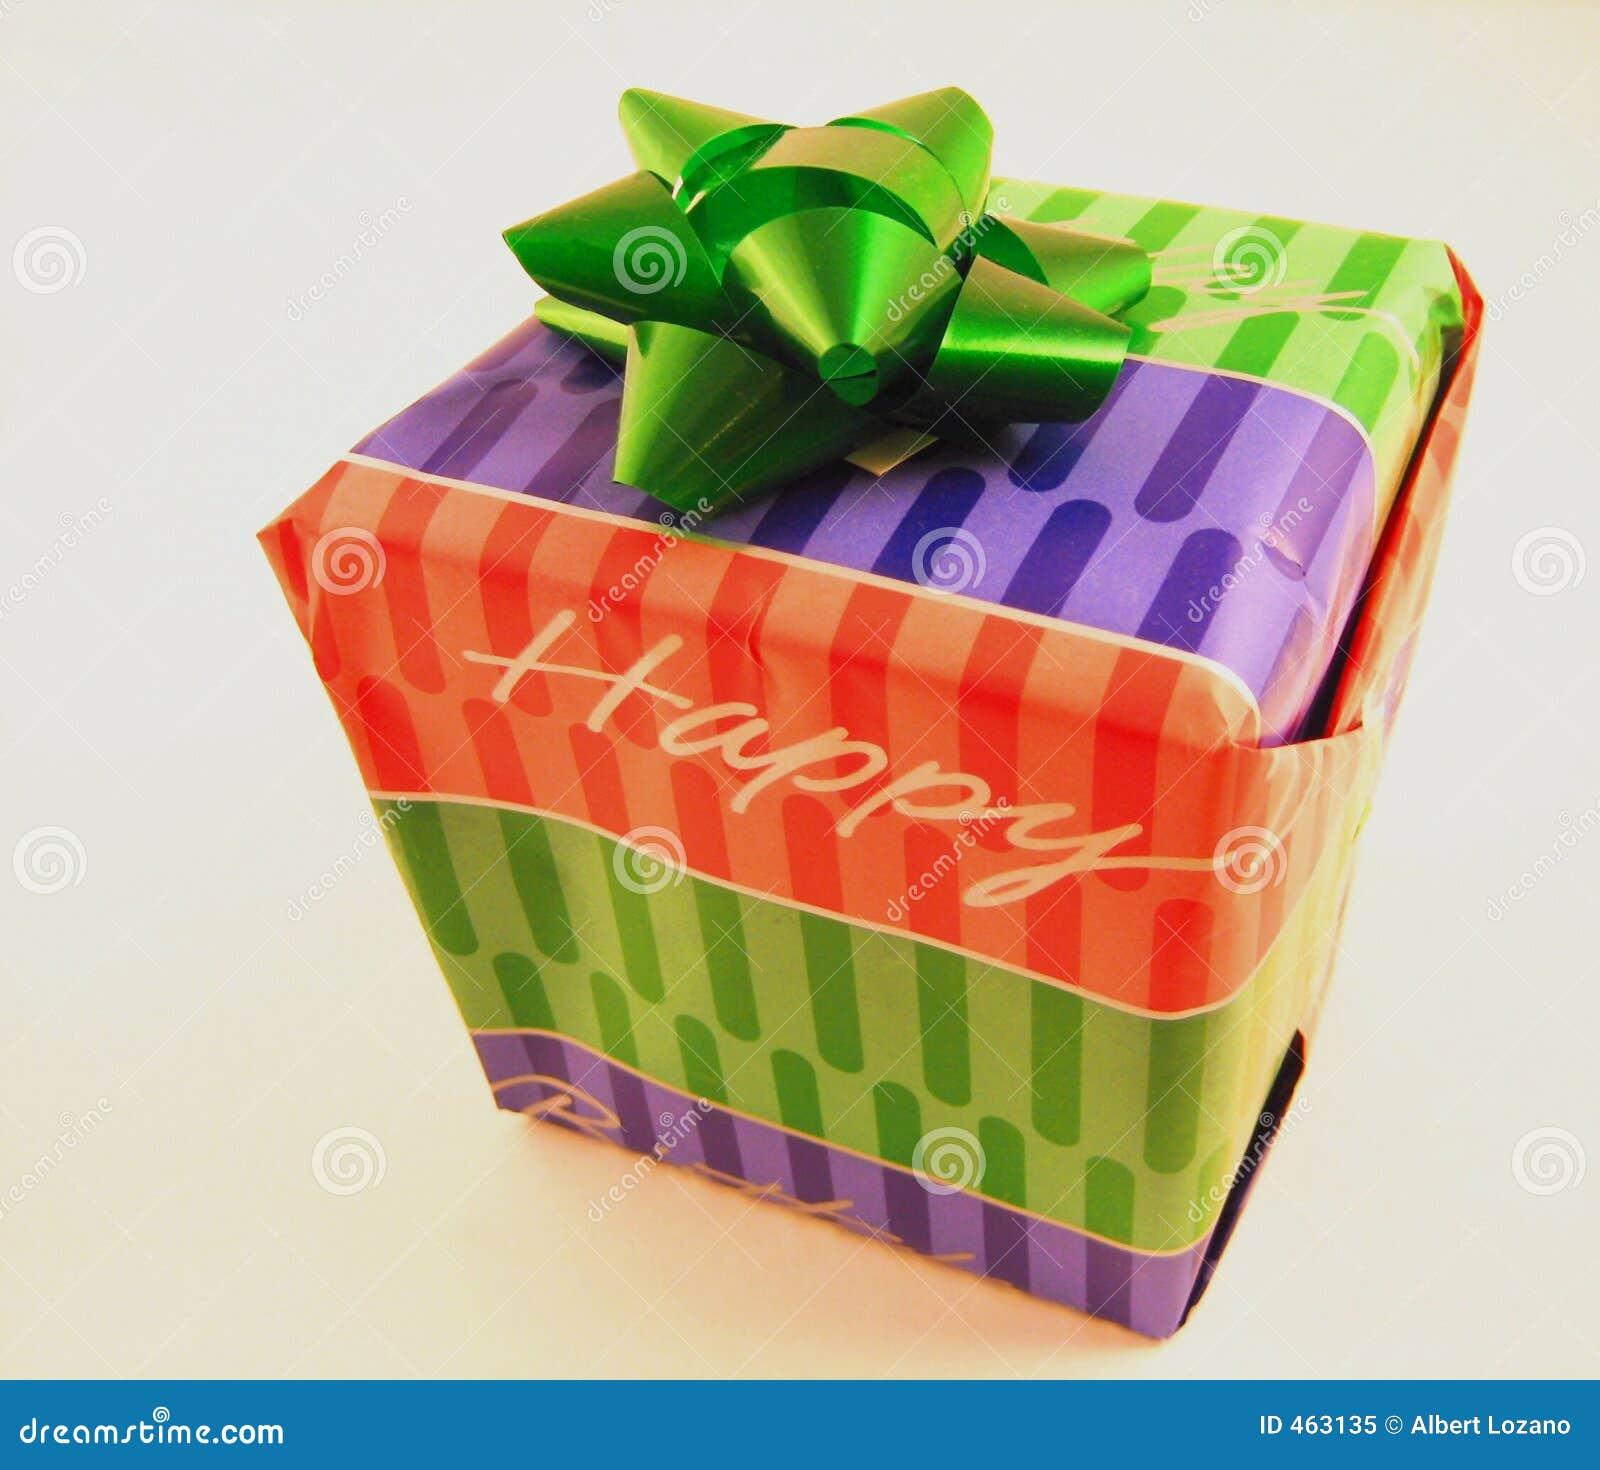 birthday gift royalty free stock photo image 463135 60th birthday clip art free 60th birthday clip art male